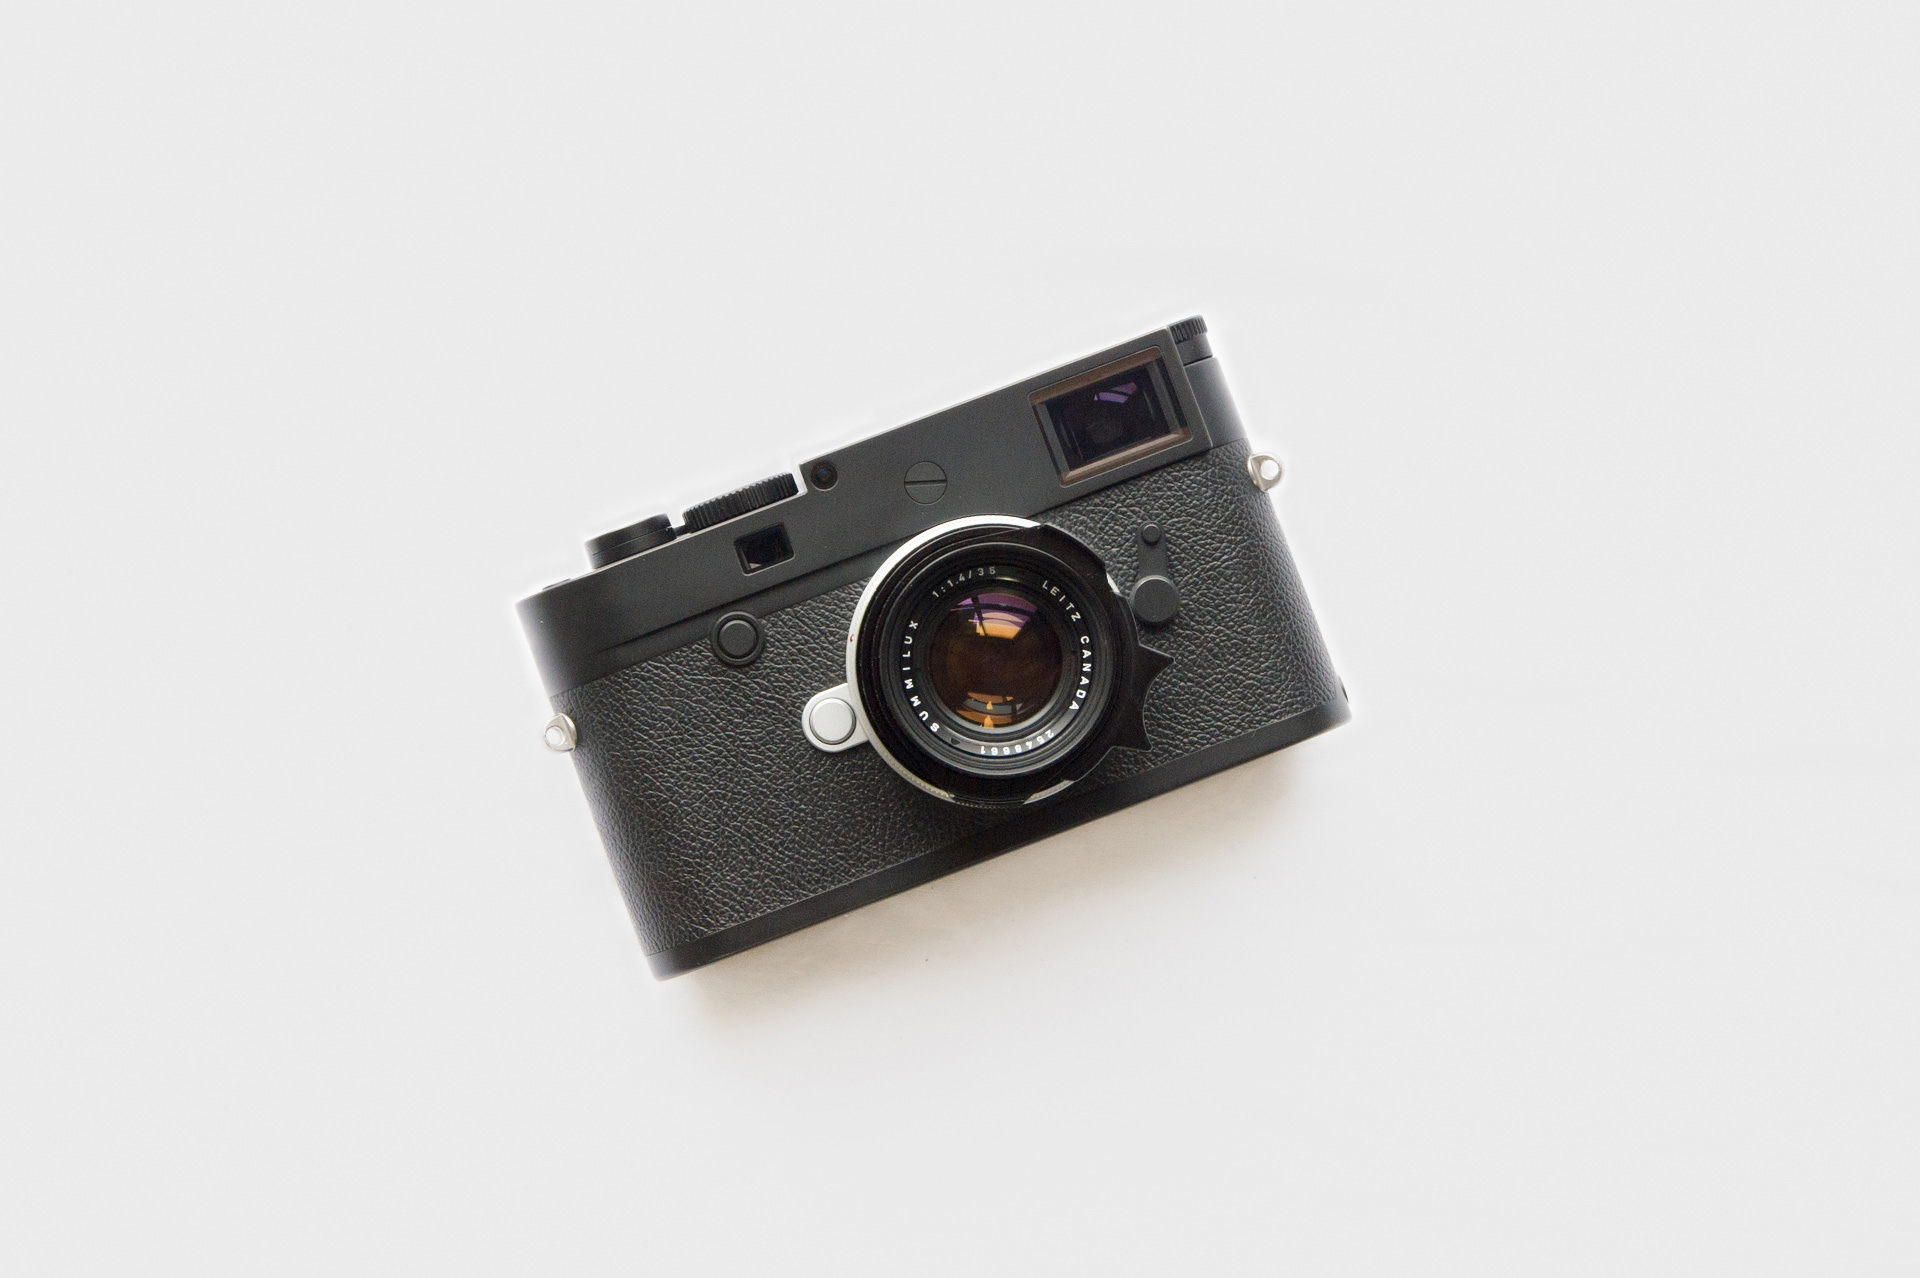 Leica M10-Dとは。Leica M10-Dの価格は?